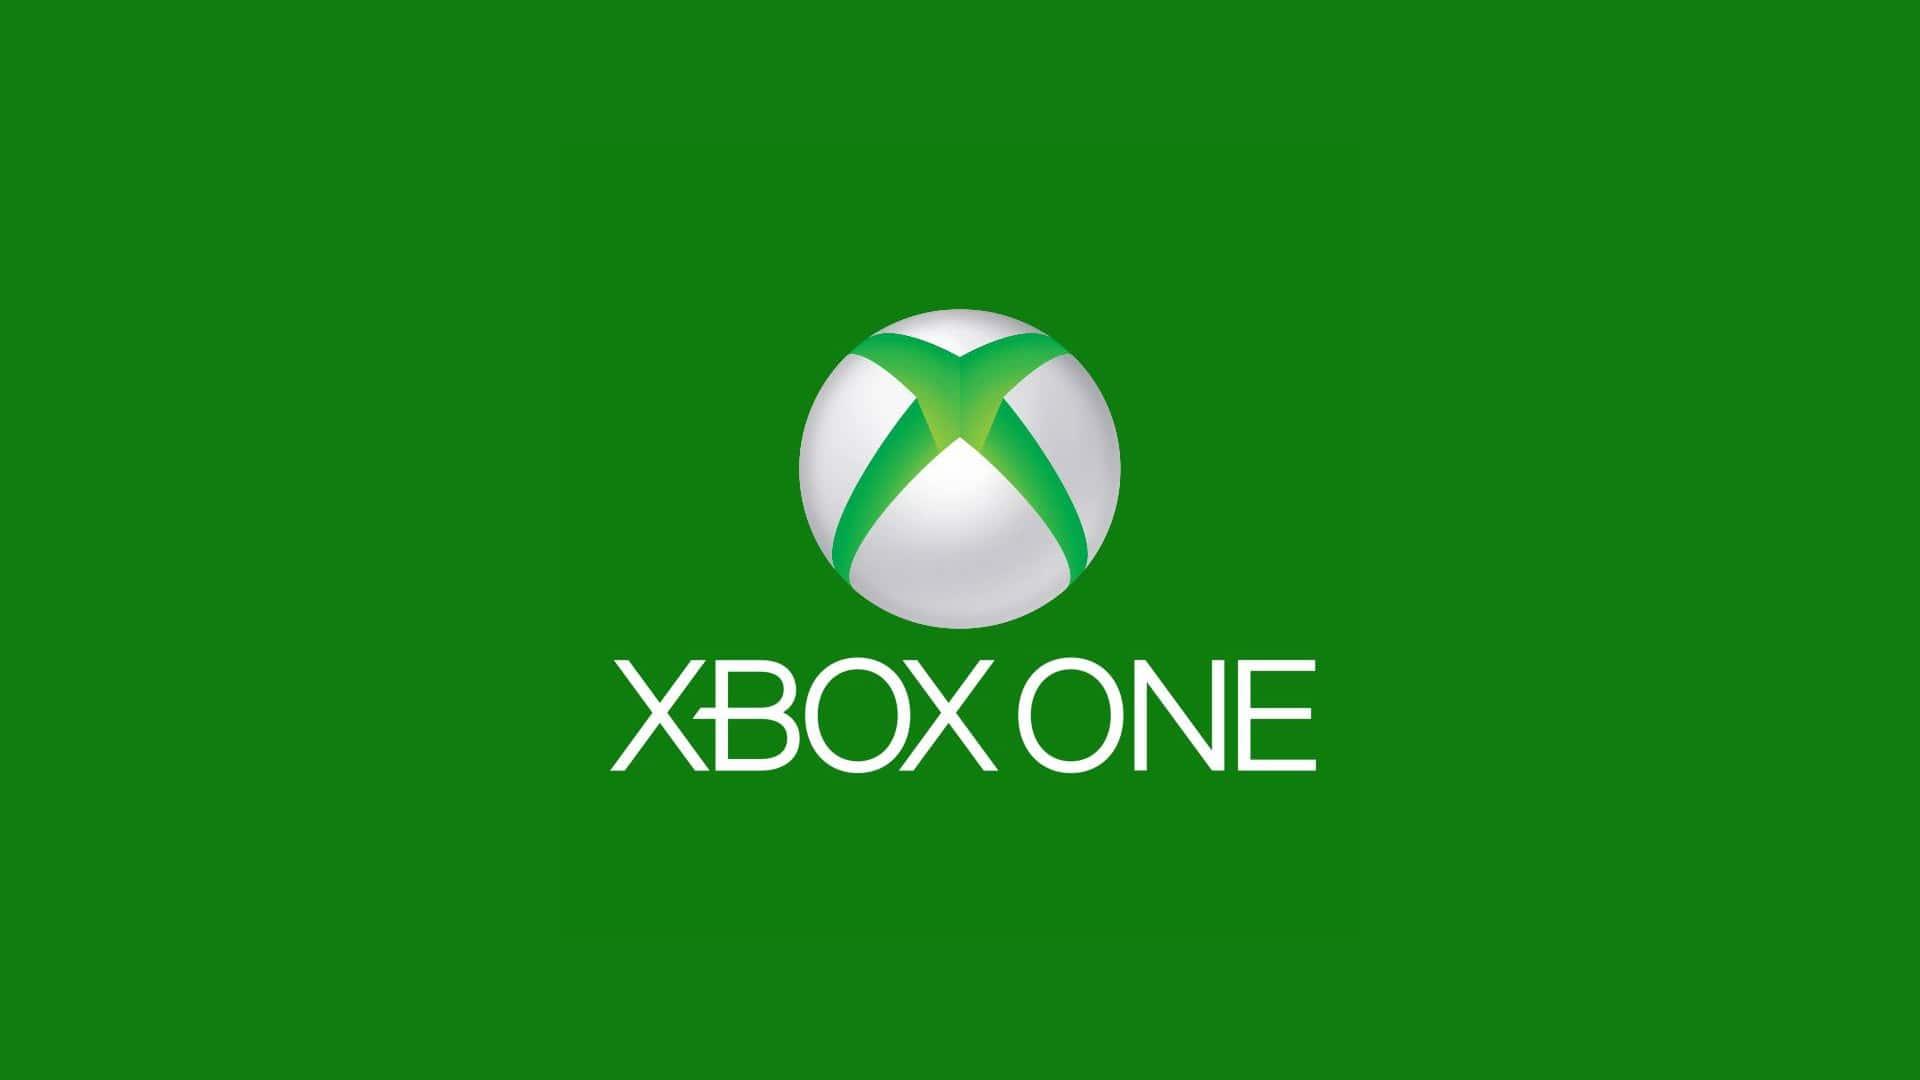 xbox-one-logo-wallpaper-1